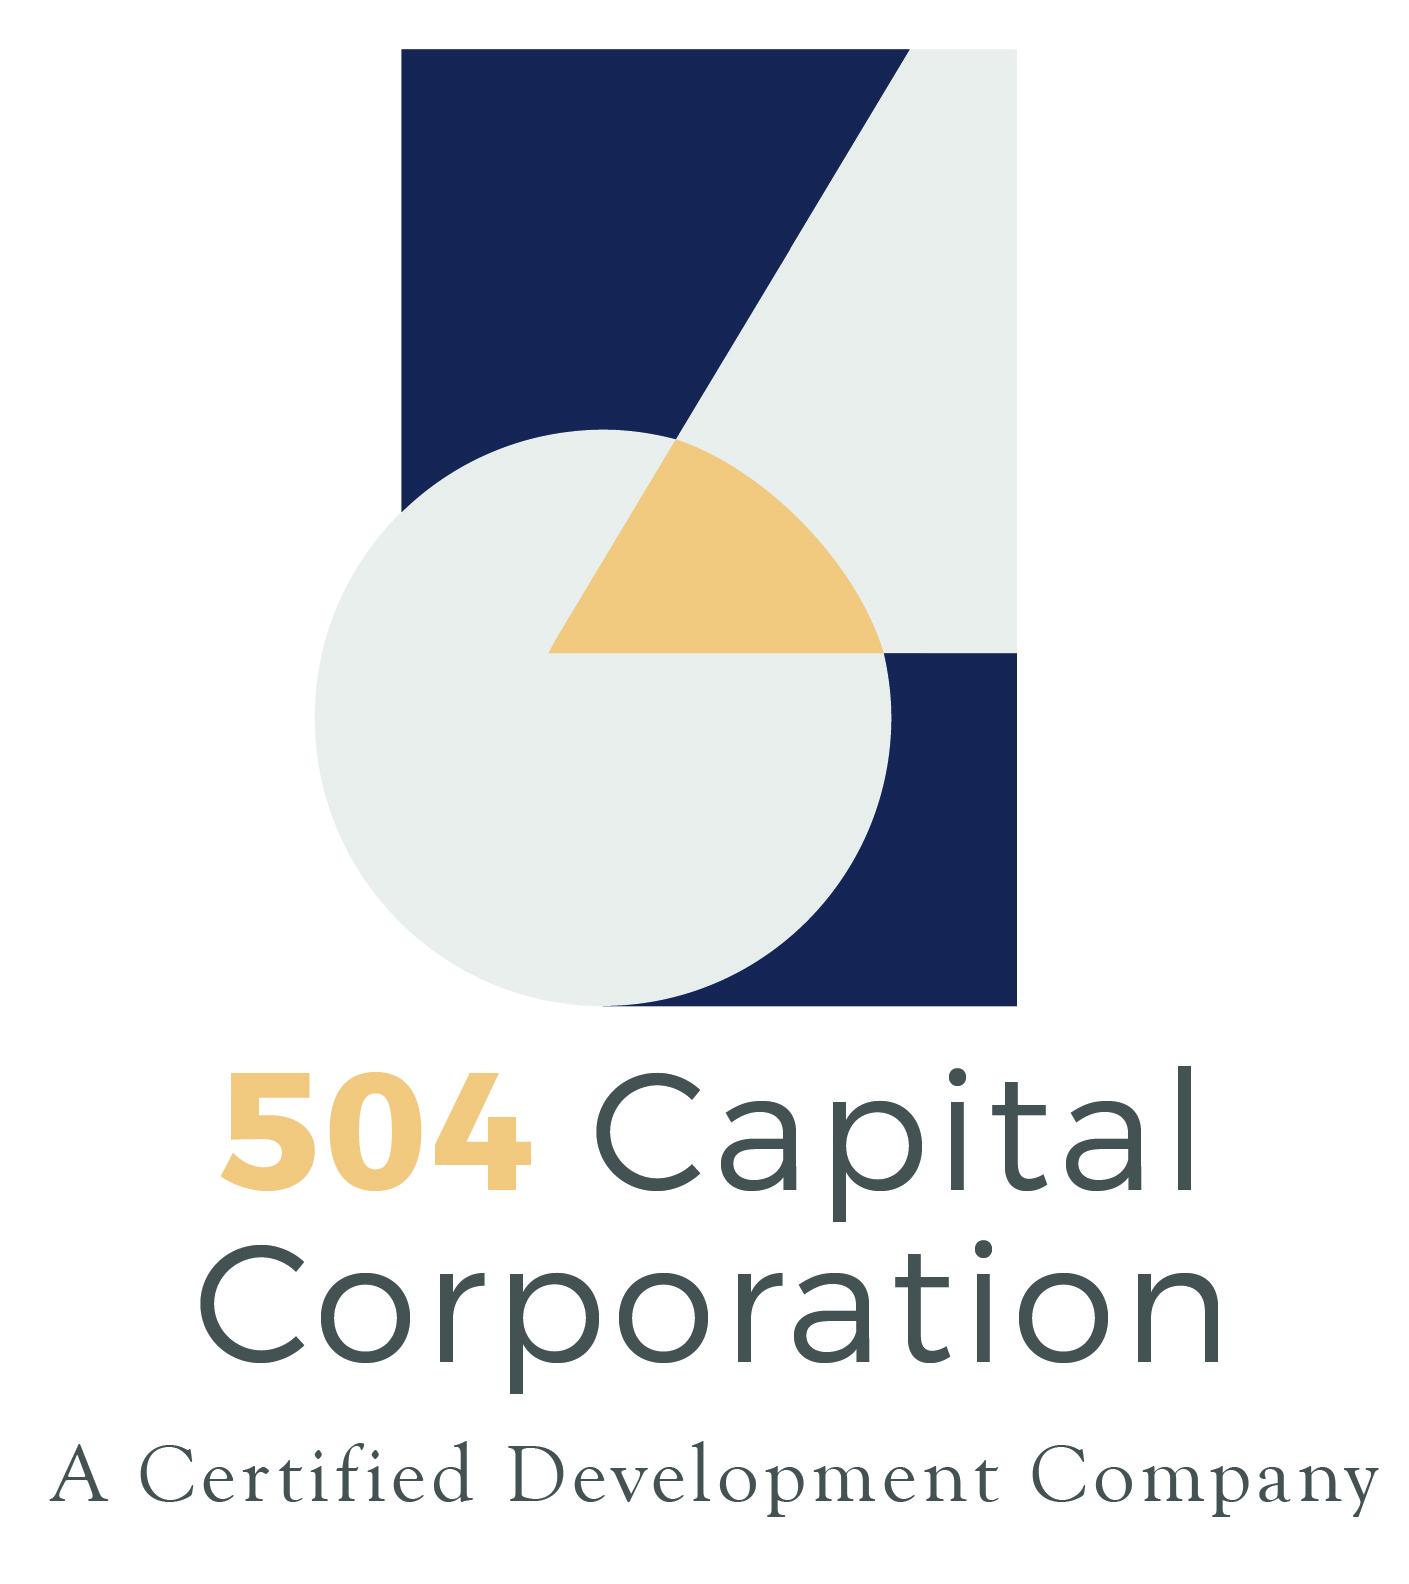 504 CAPital